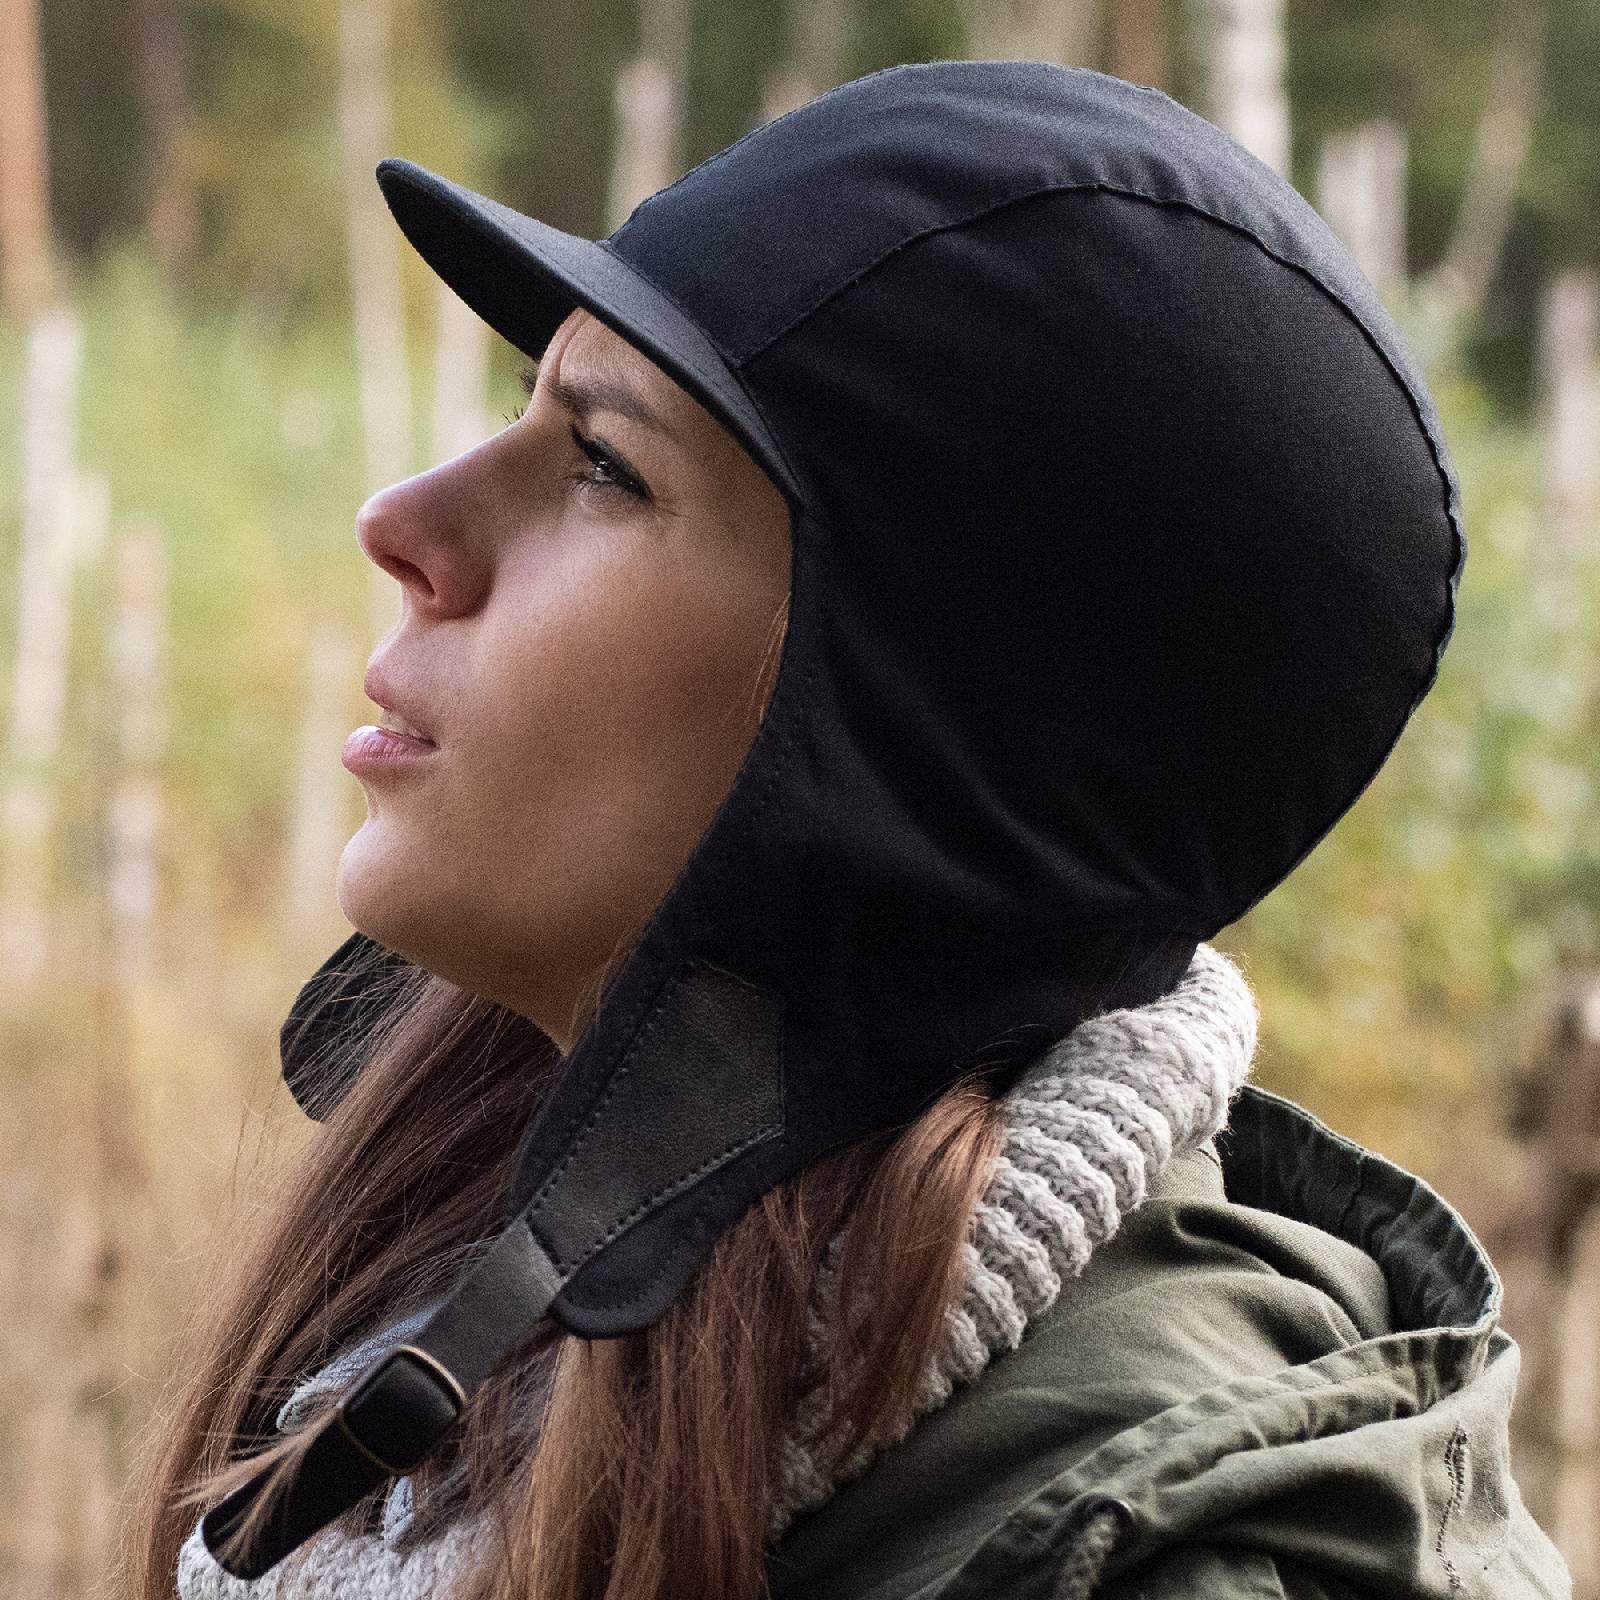 Waterproof waxed cotton womens trapper hat kamikaze outdoor hunter cap chapka